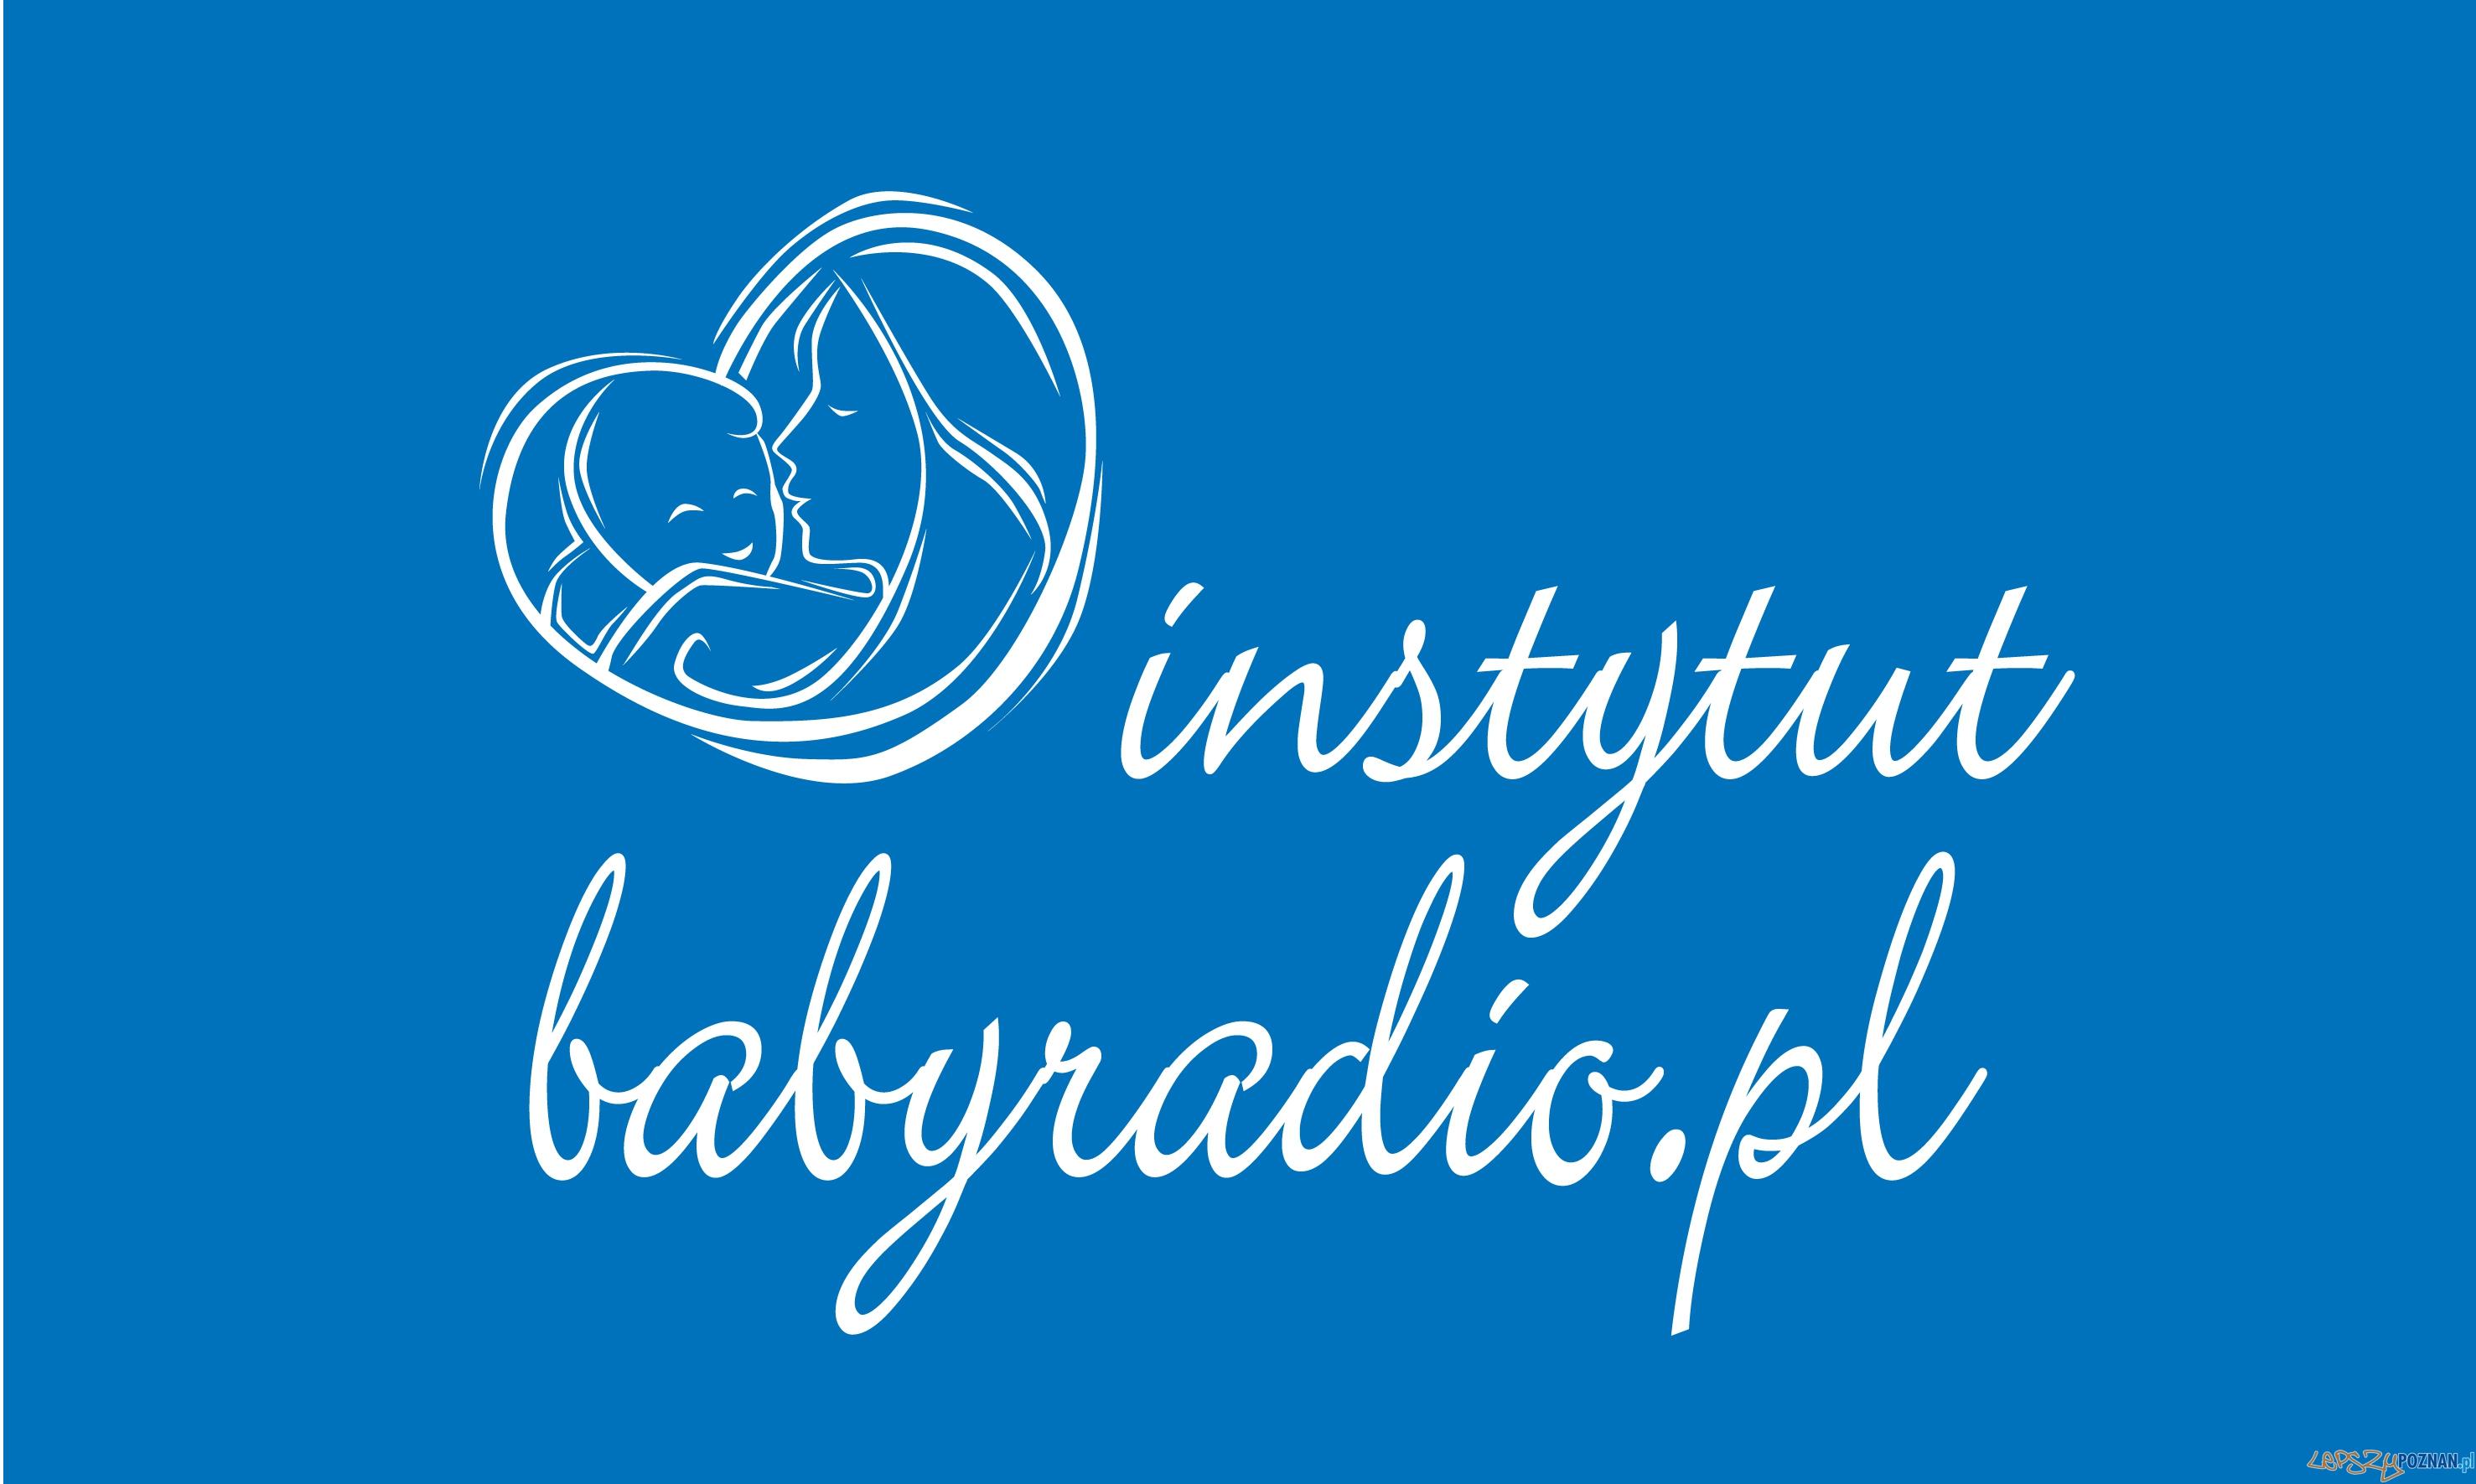 Instytut Babyradio  Foto: Instytut Babyradio